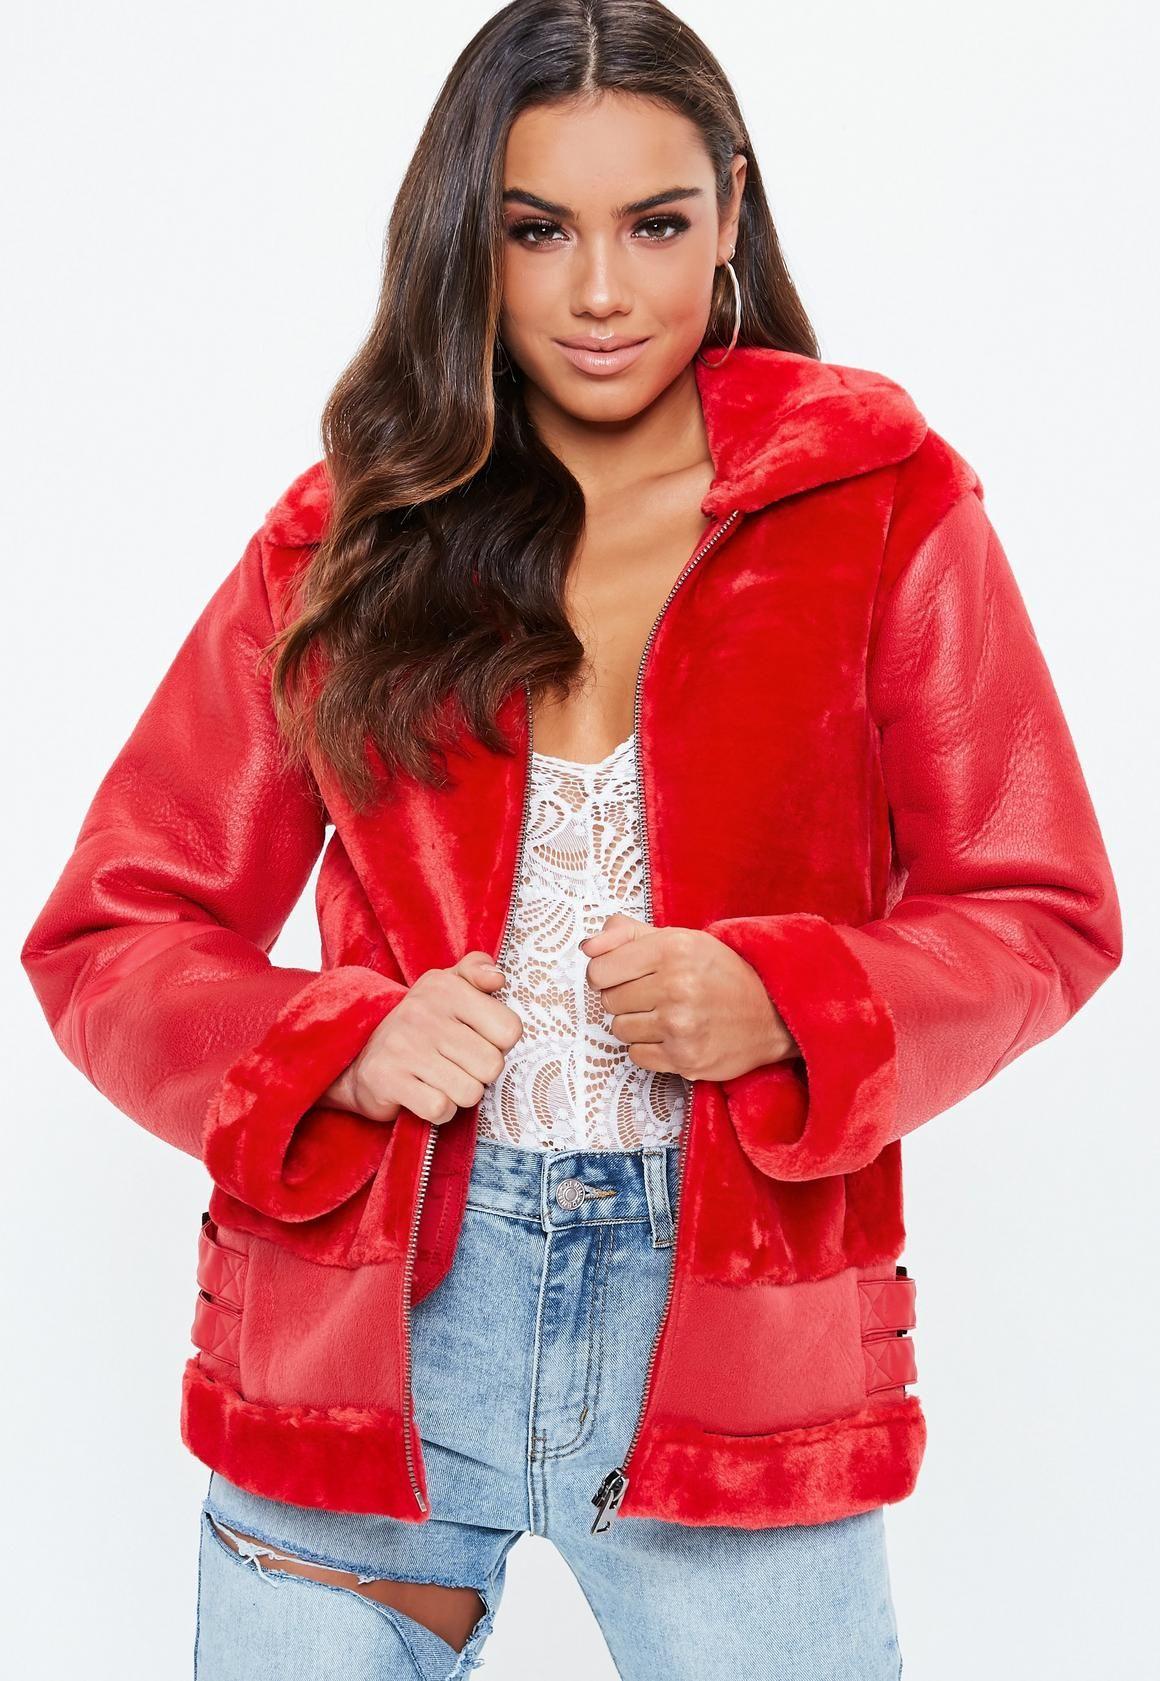 Red Aviator Jacket for women